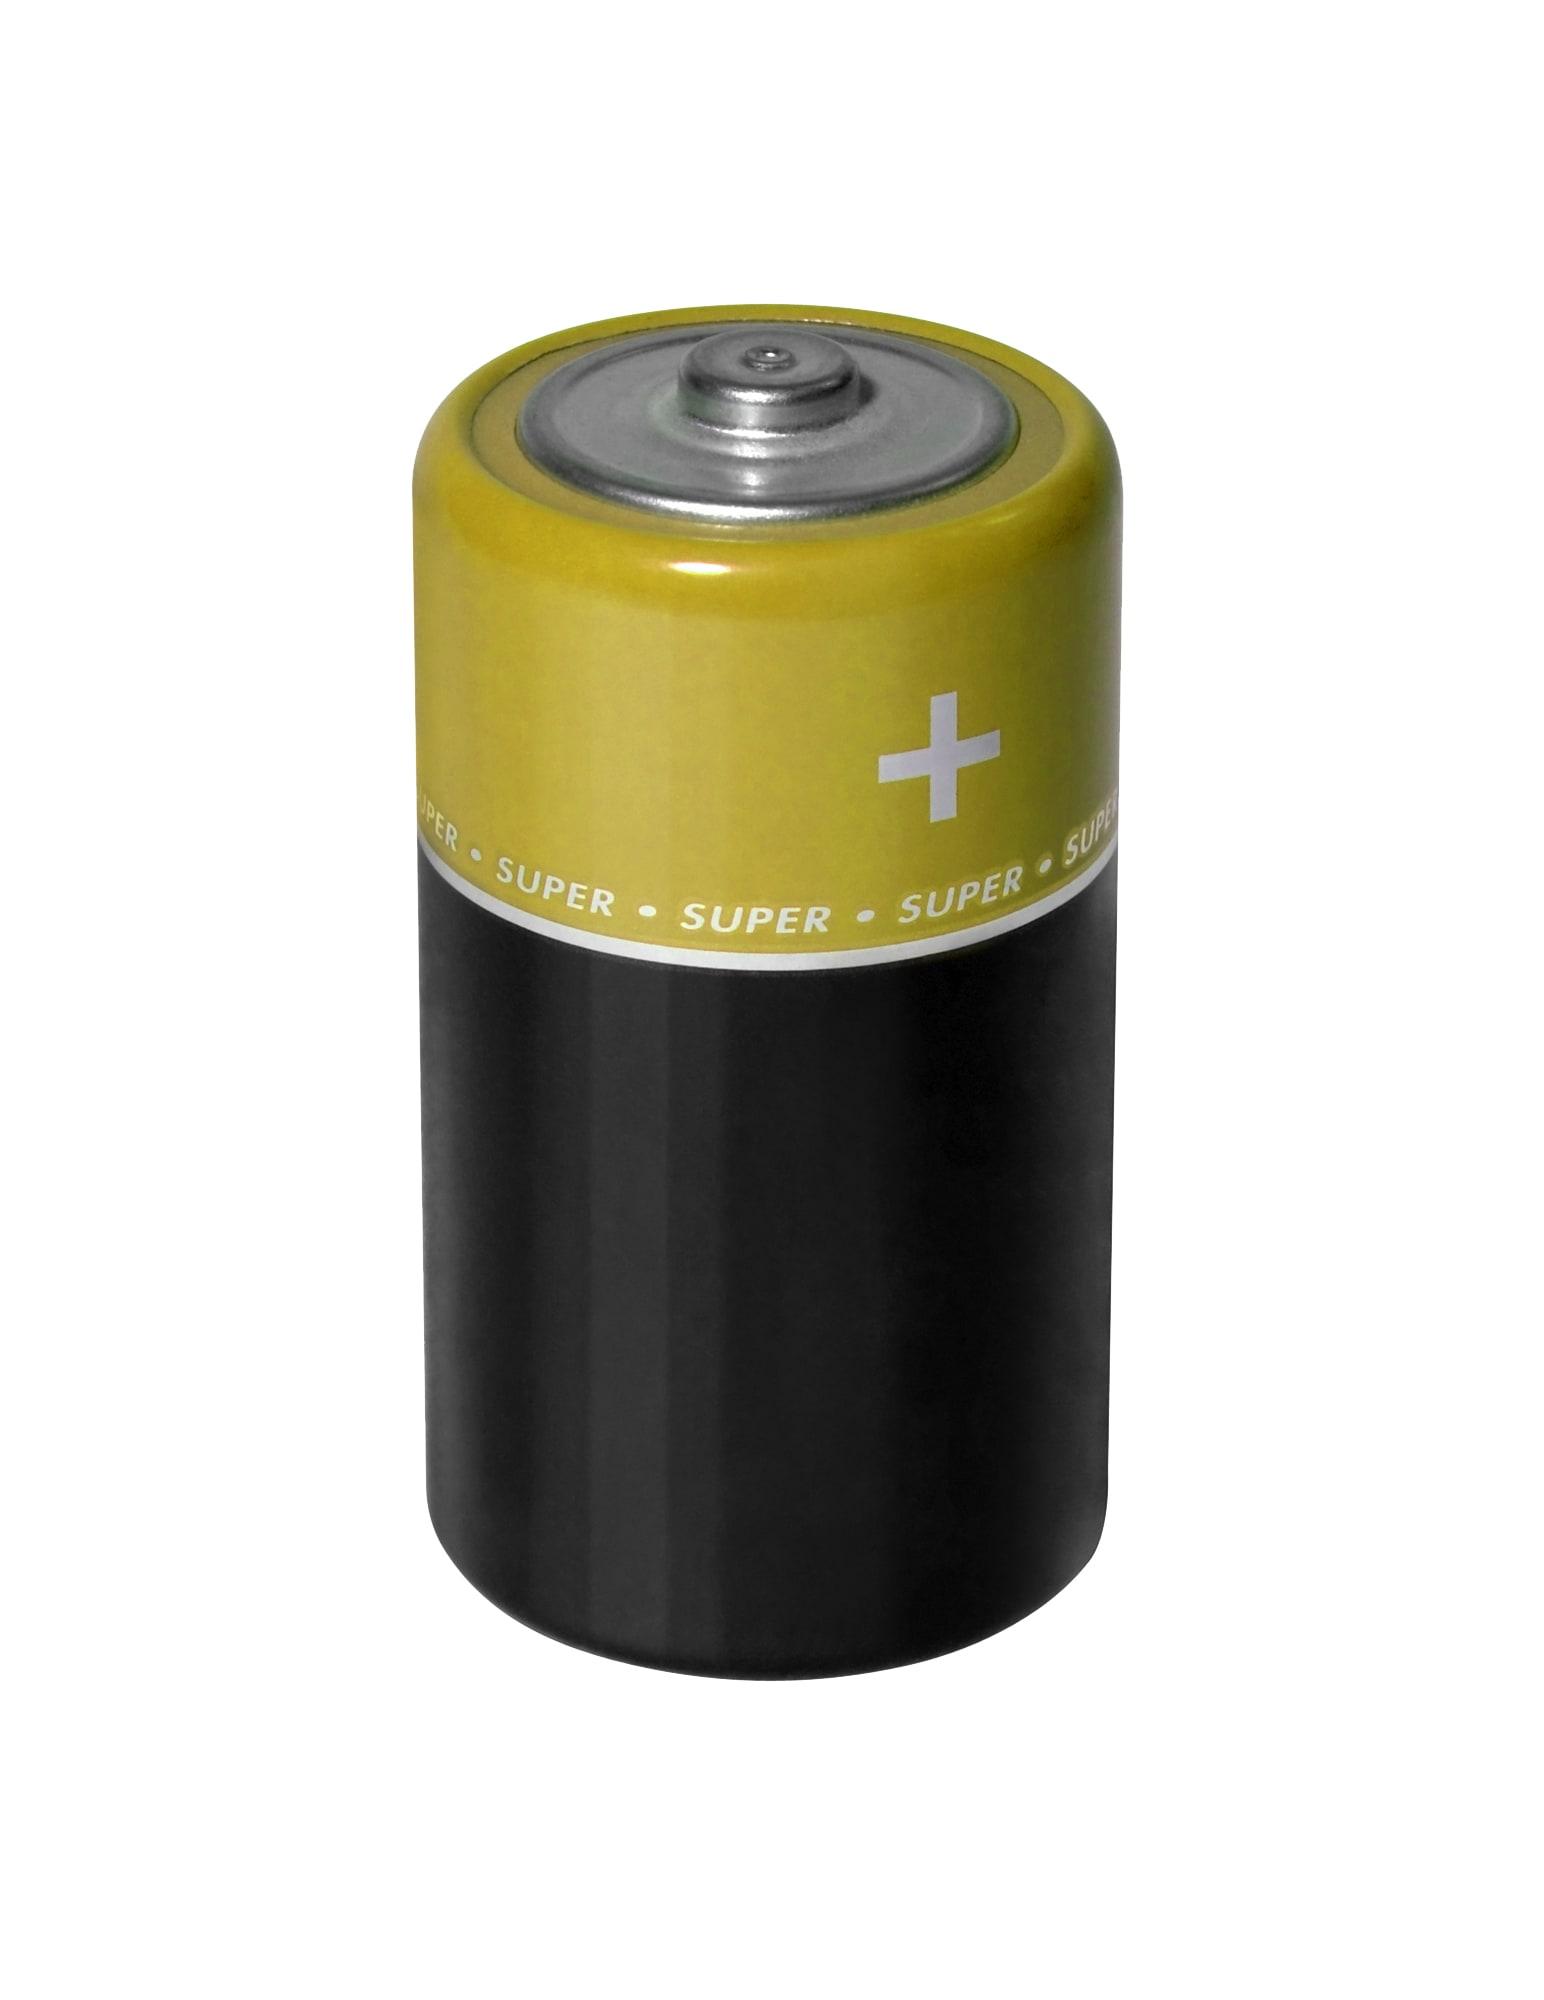 CES Omega Flex 5x Lithium-Ersatzbatterien CR2